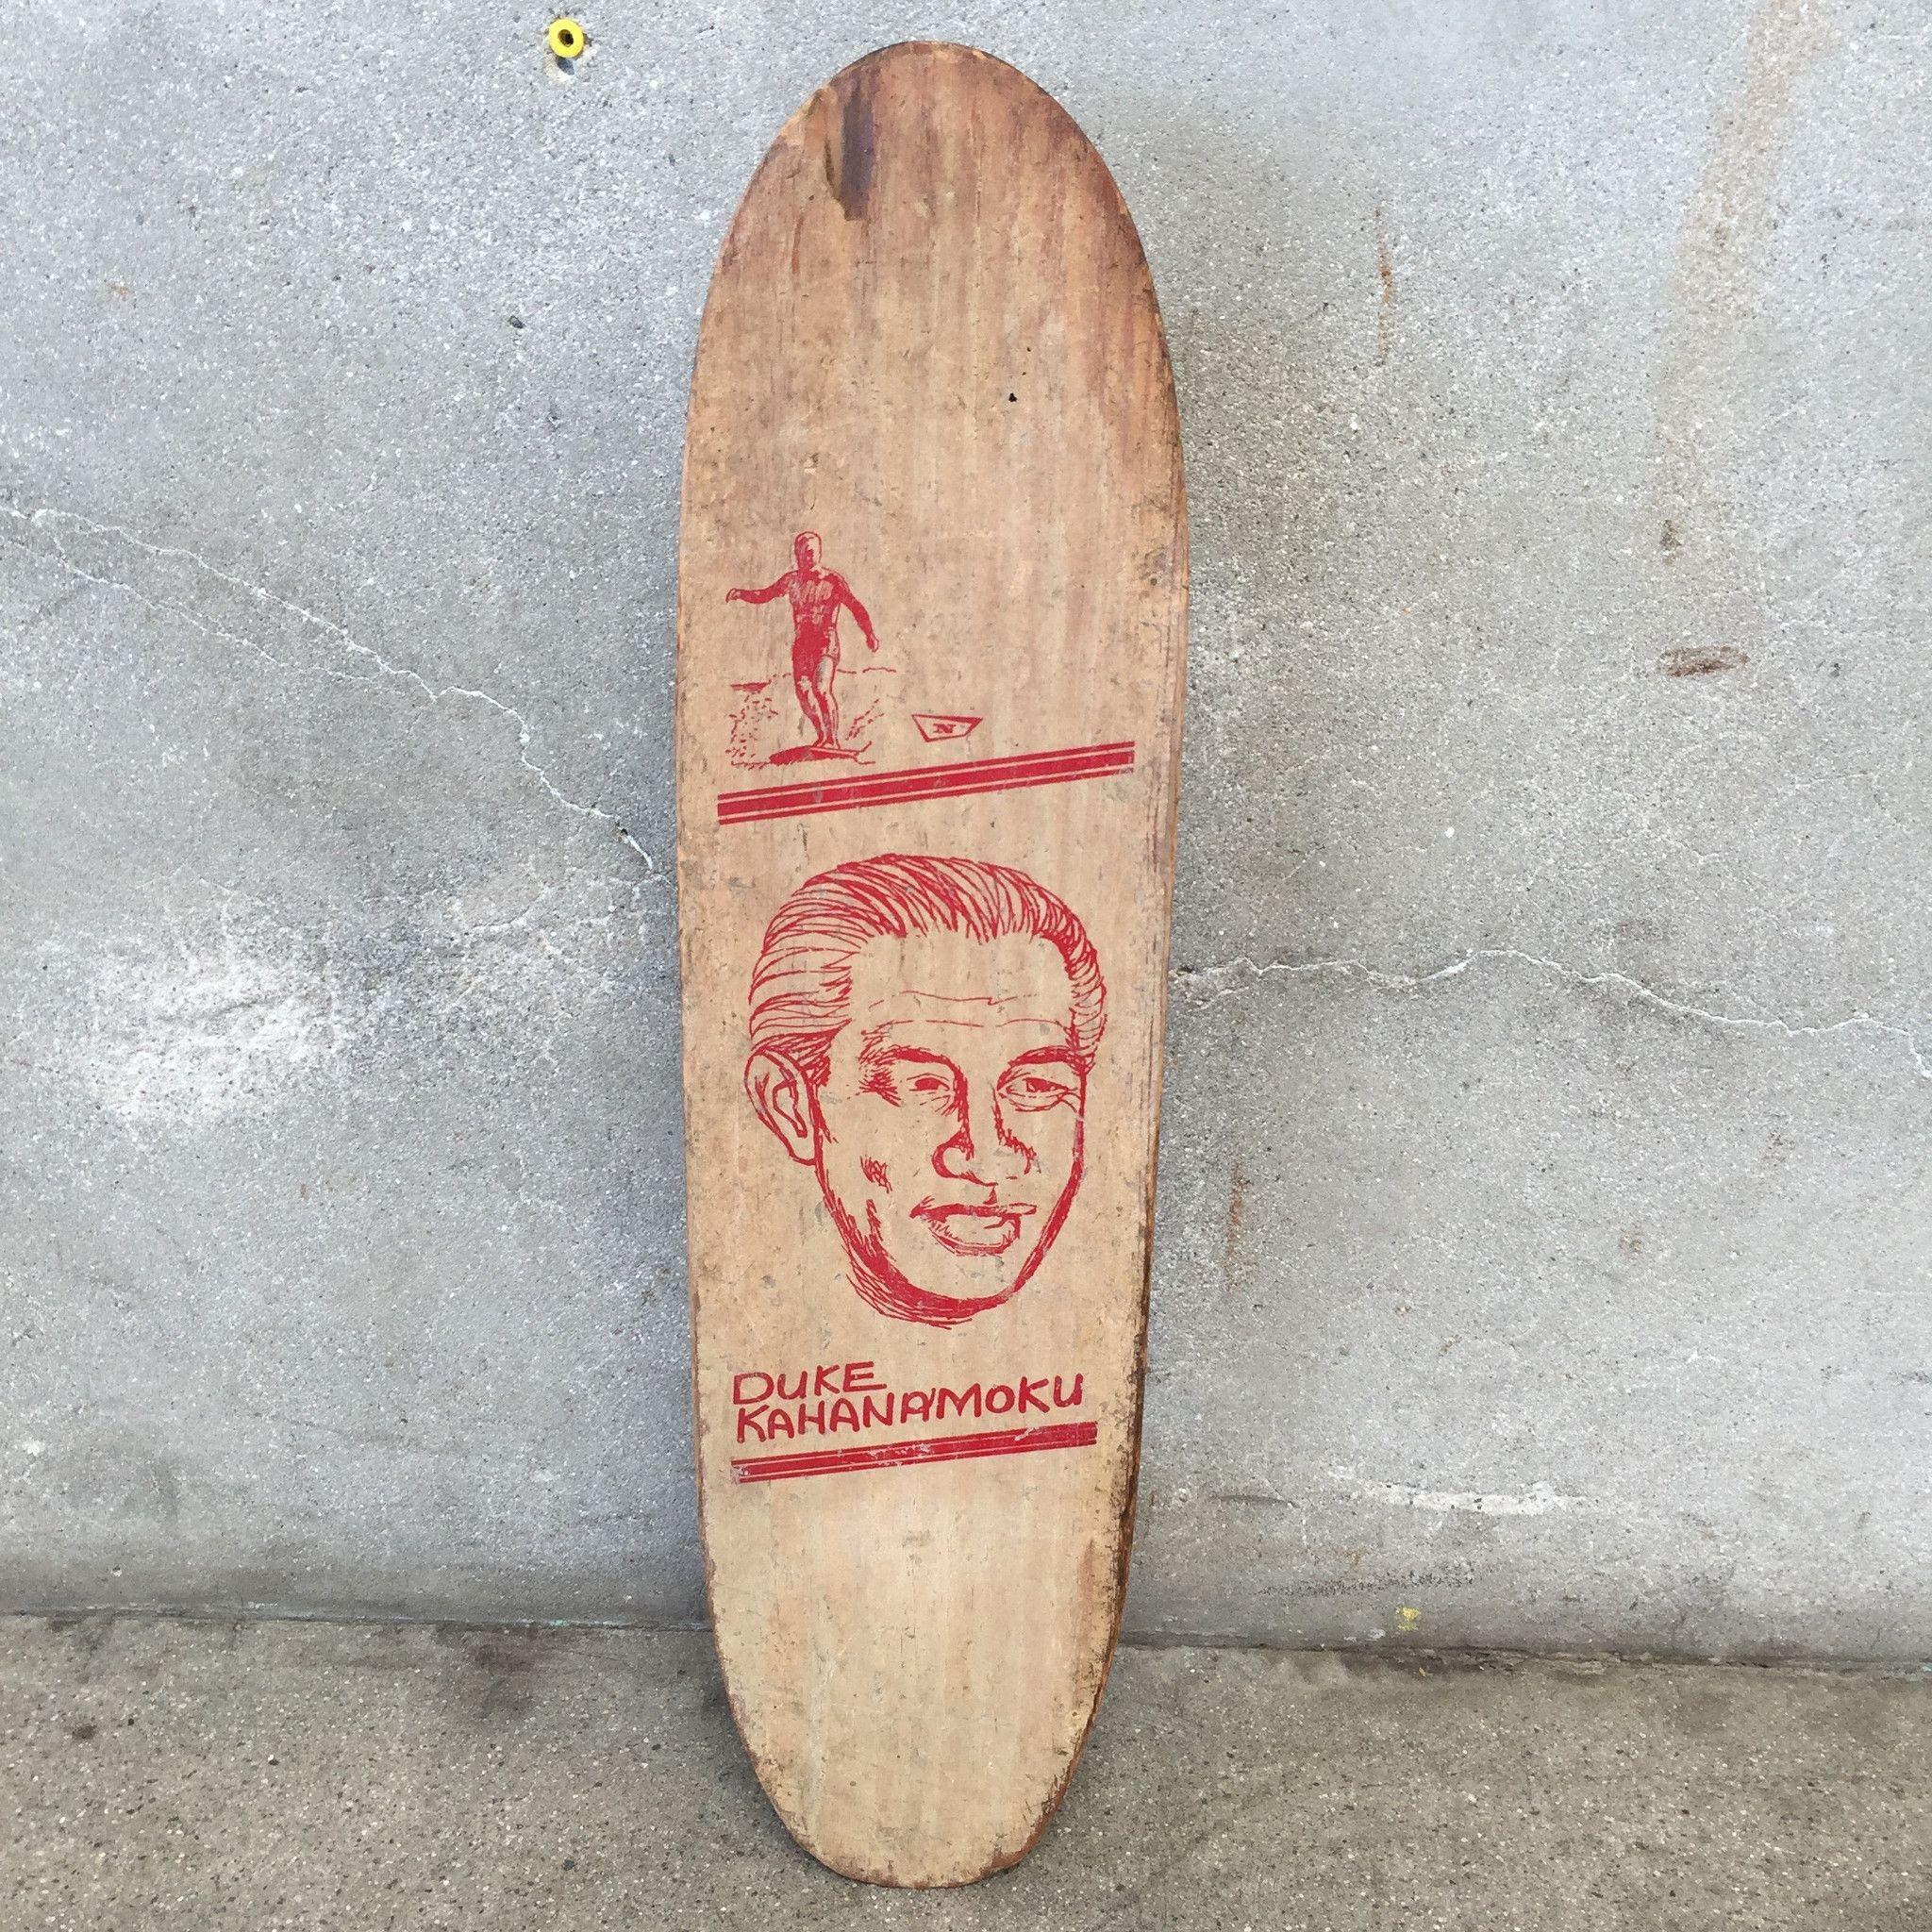 Vintage Nash Duke Kahanamoku Skateboard